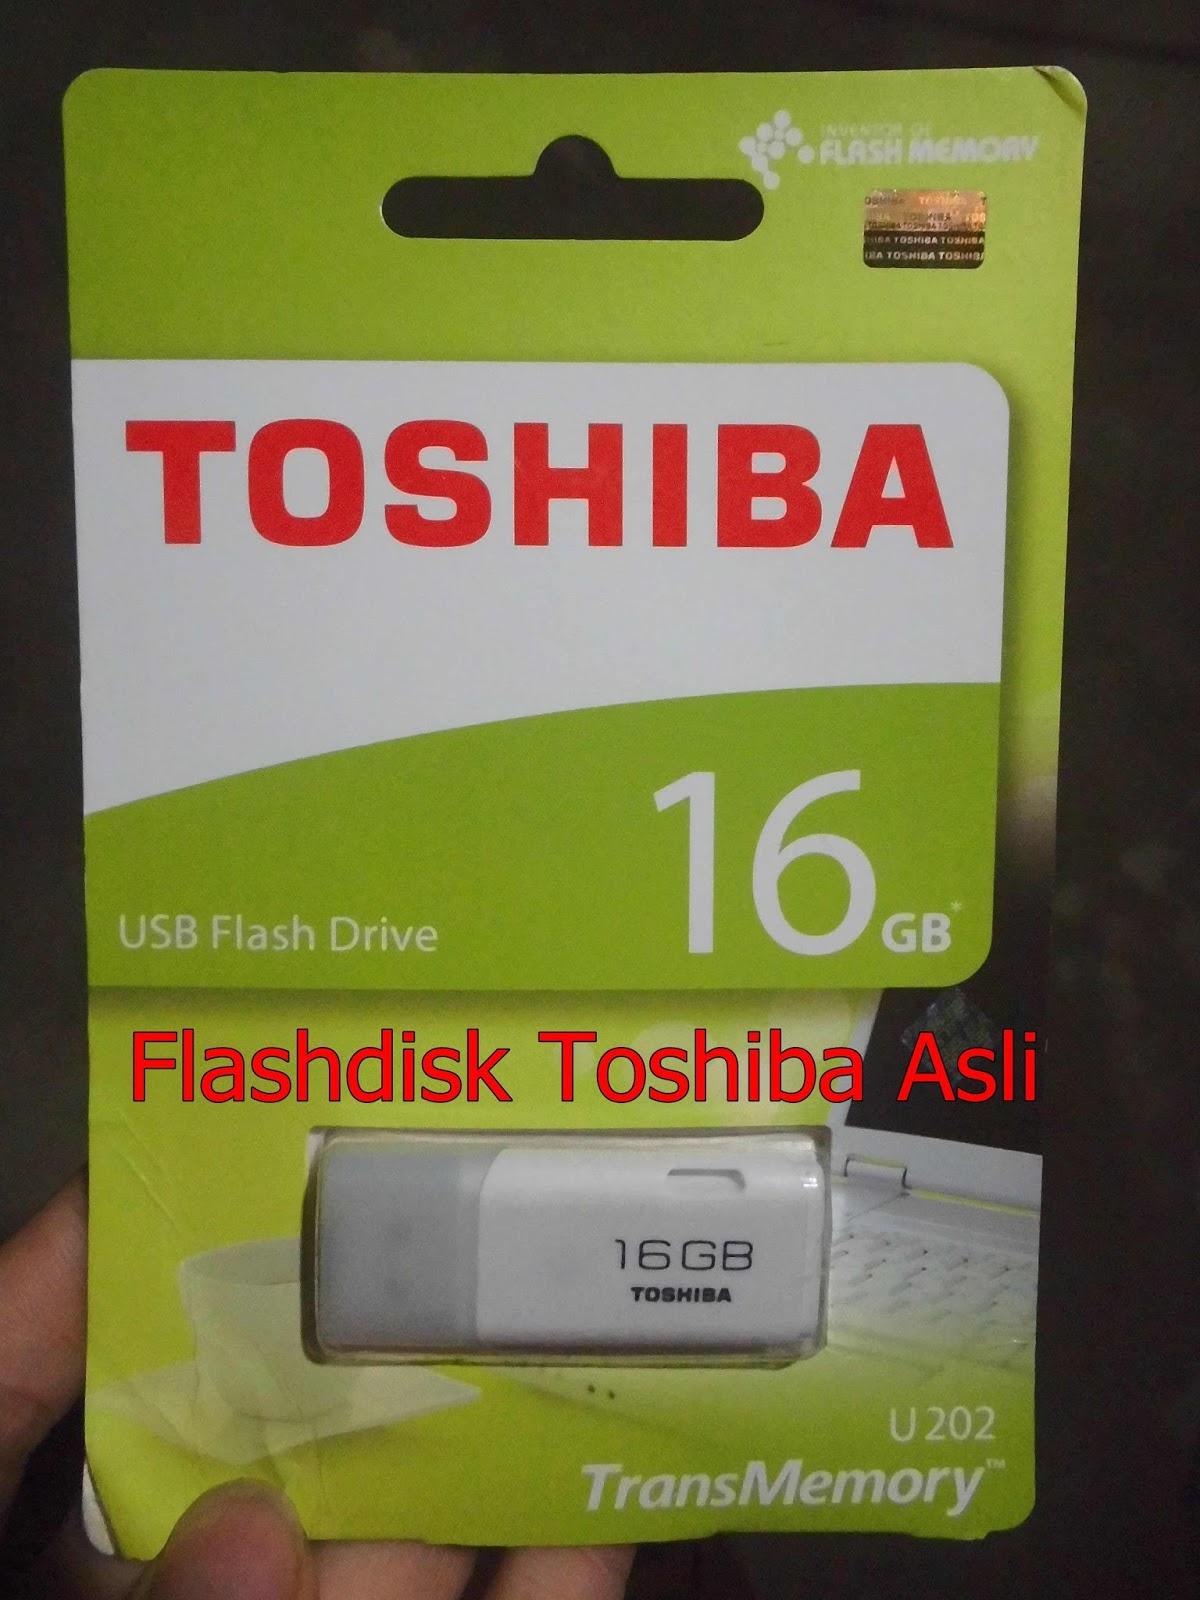 Tips Mudah Membedakan Flashdisk Toshiba Asli Dengan Yang Palsu Ter Flasdisk 32 Gb Flash Drive